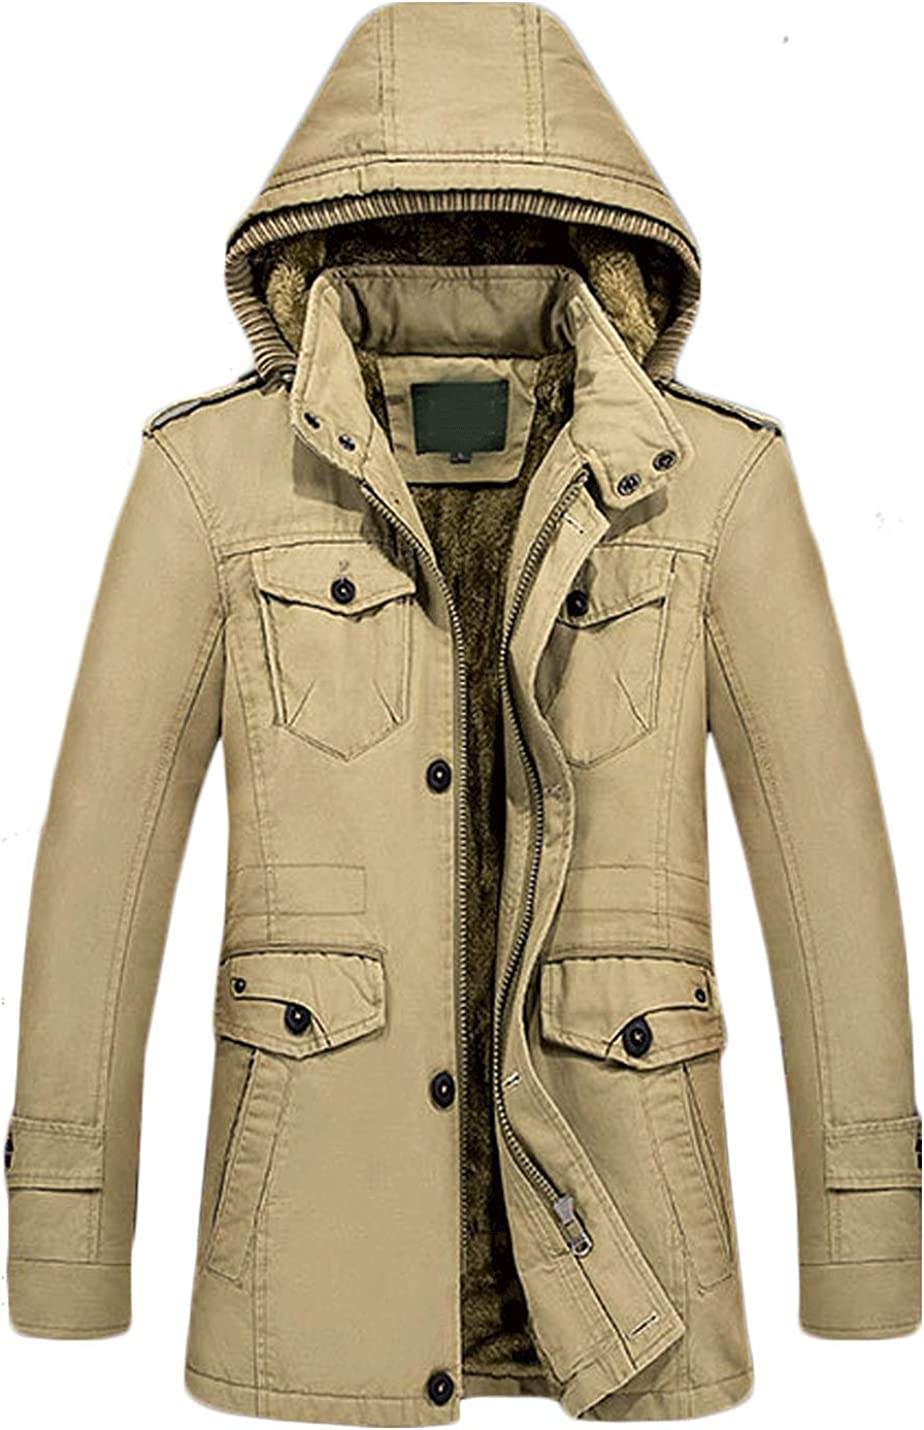 Jenkoon Men's Winter Thicken Faux Fur Parka Jacket with Detachable Hood